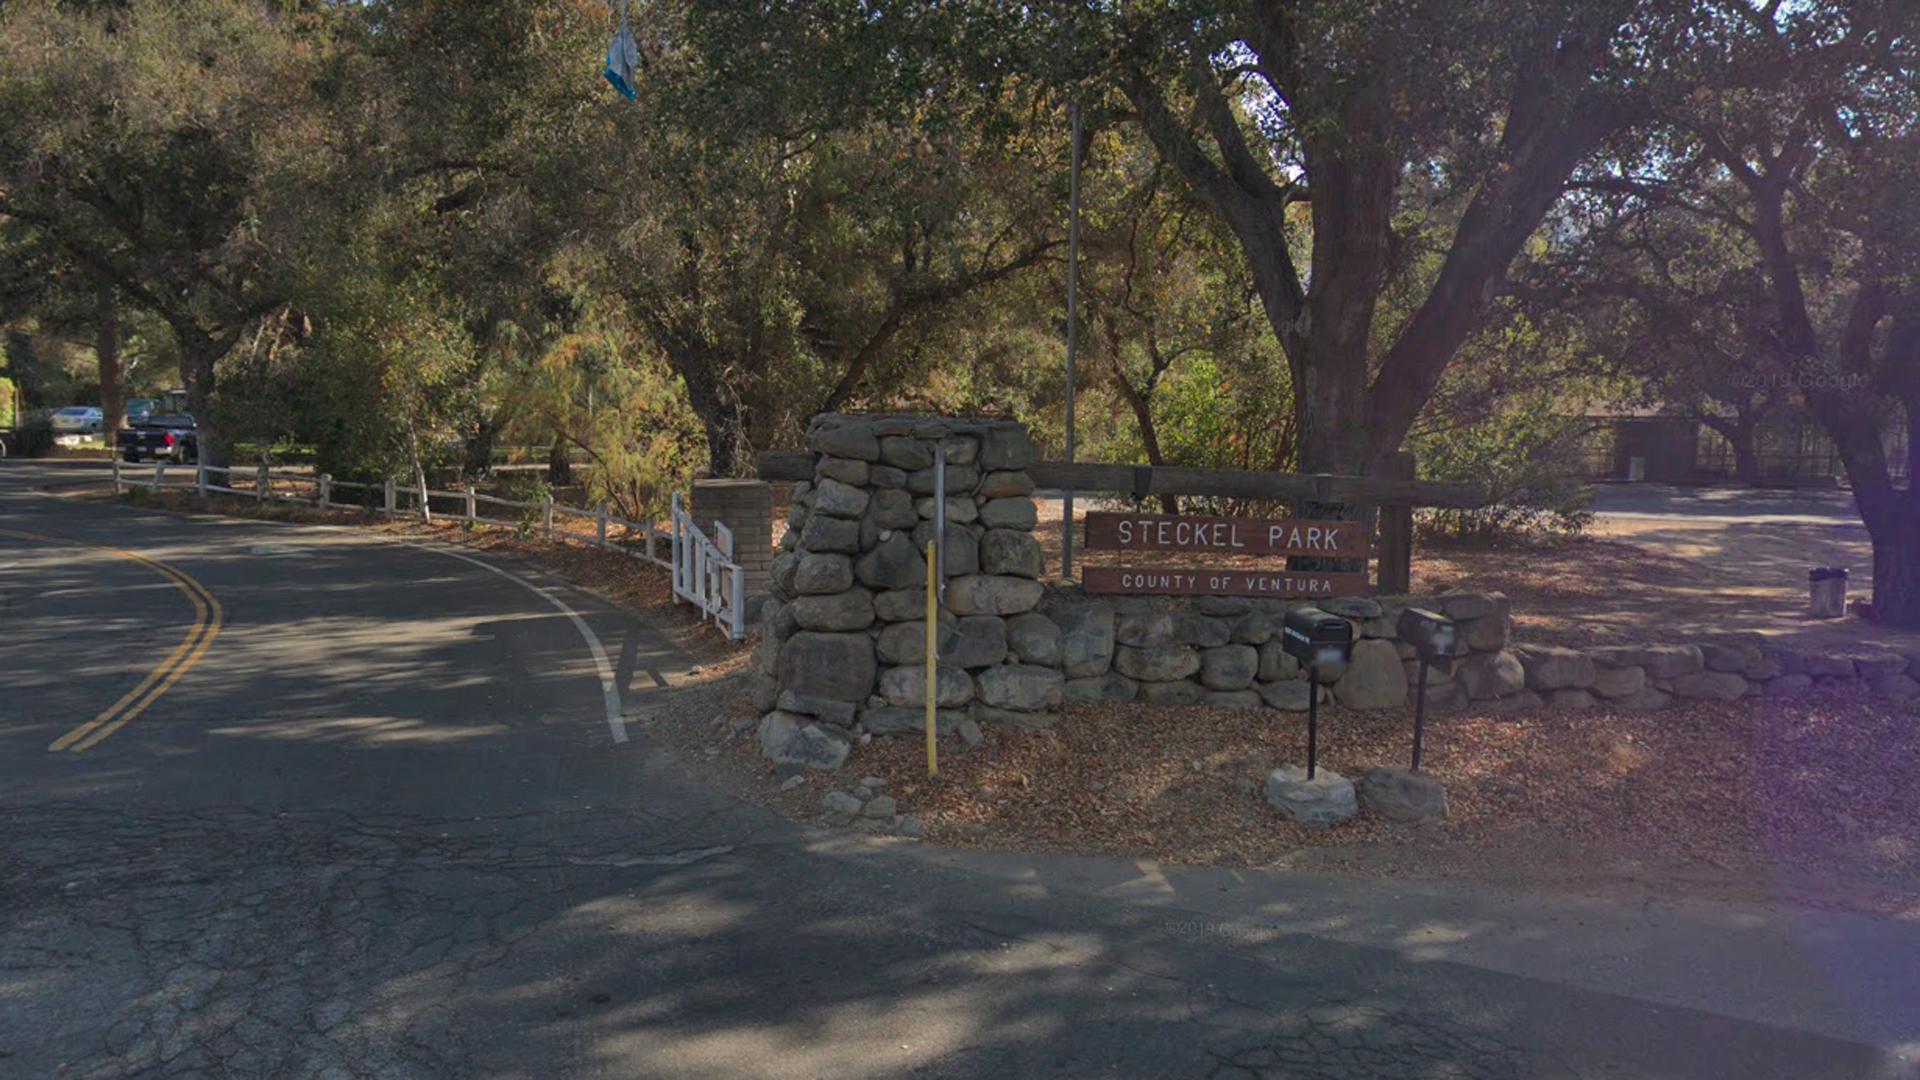 Steckel Park, 8080 Mistletoe Road in Santa Paula, pictured in a Google Street View image in November of 2018.